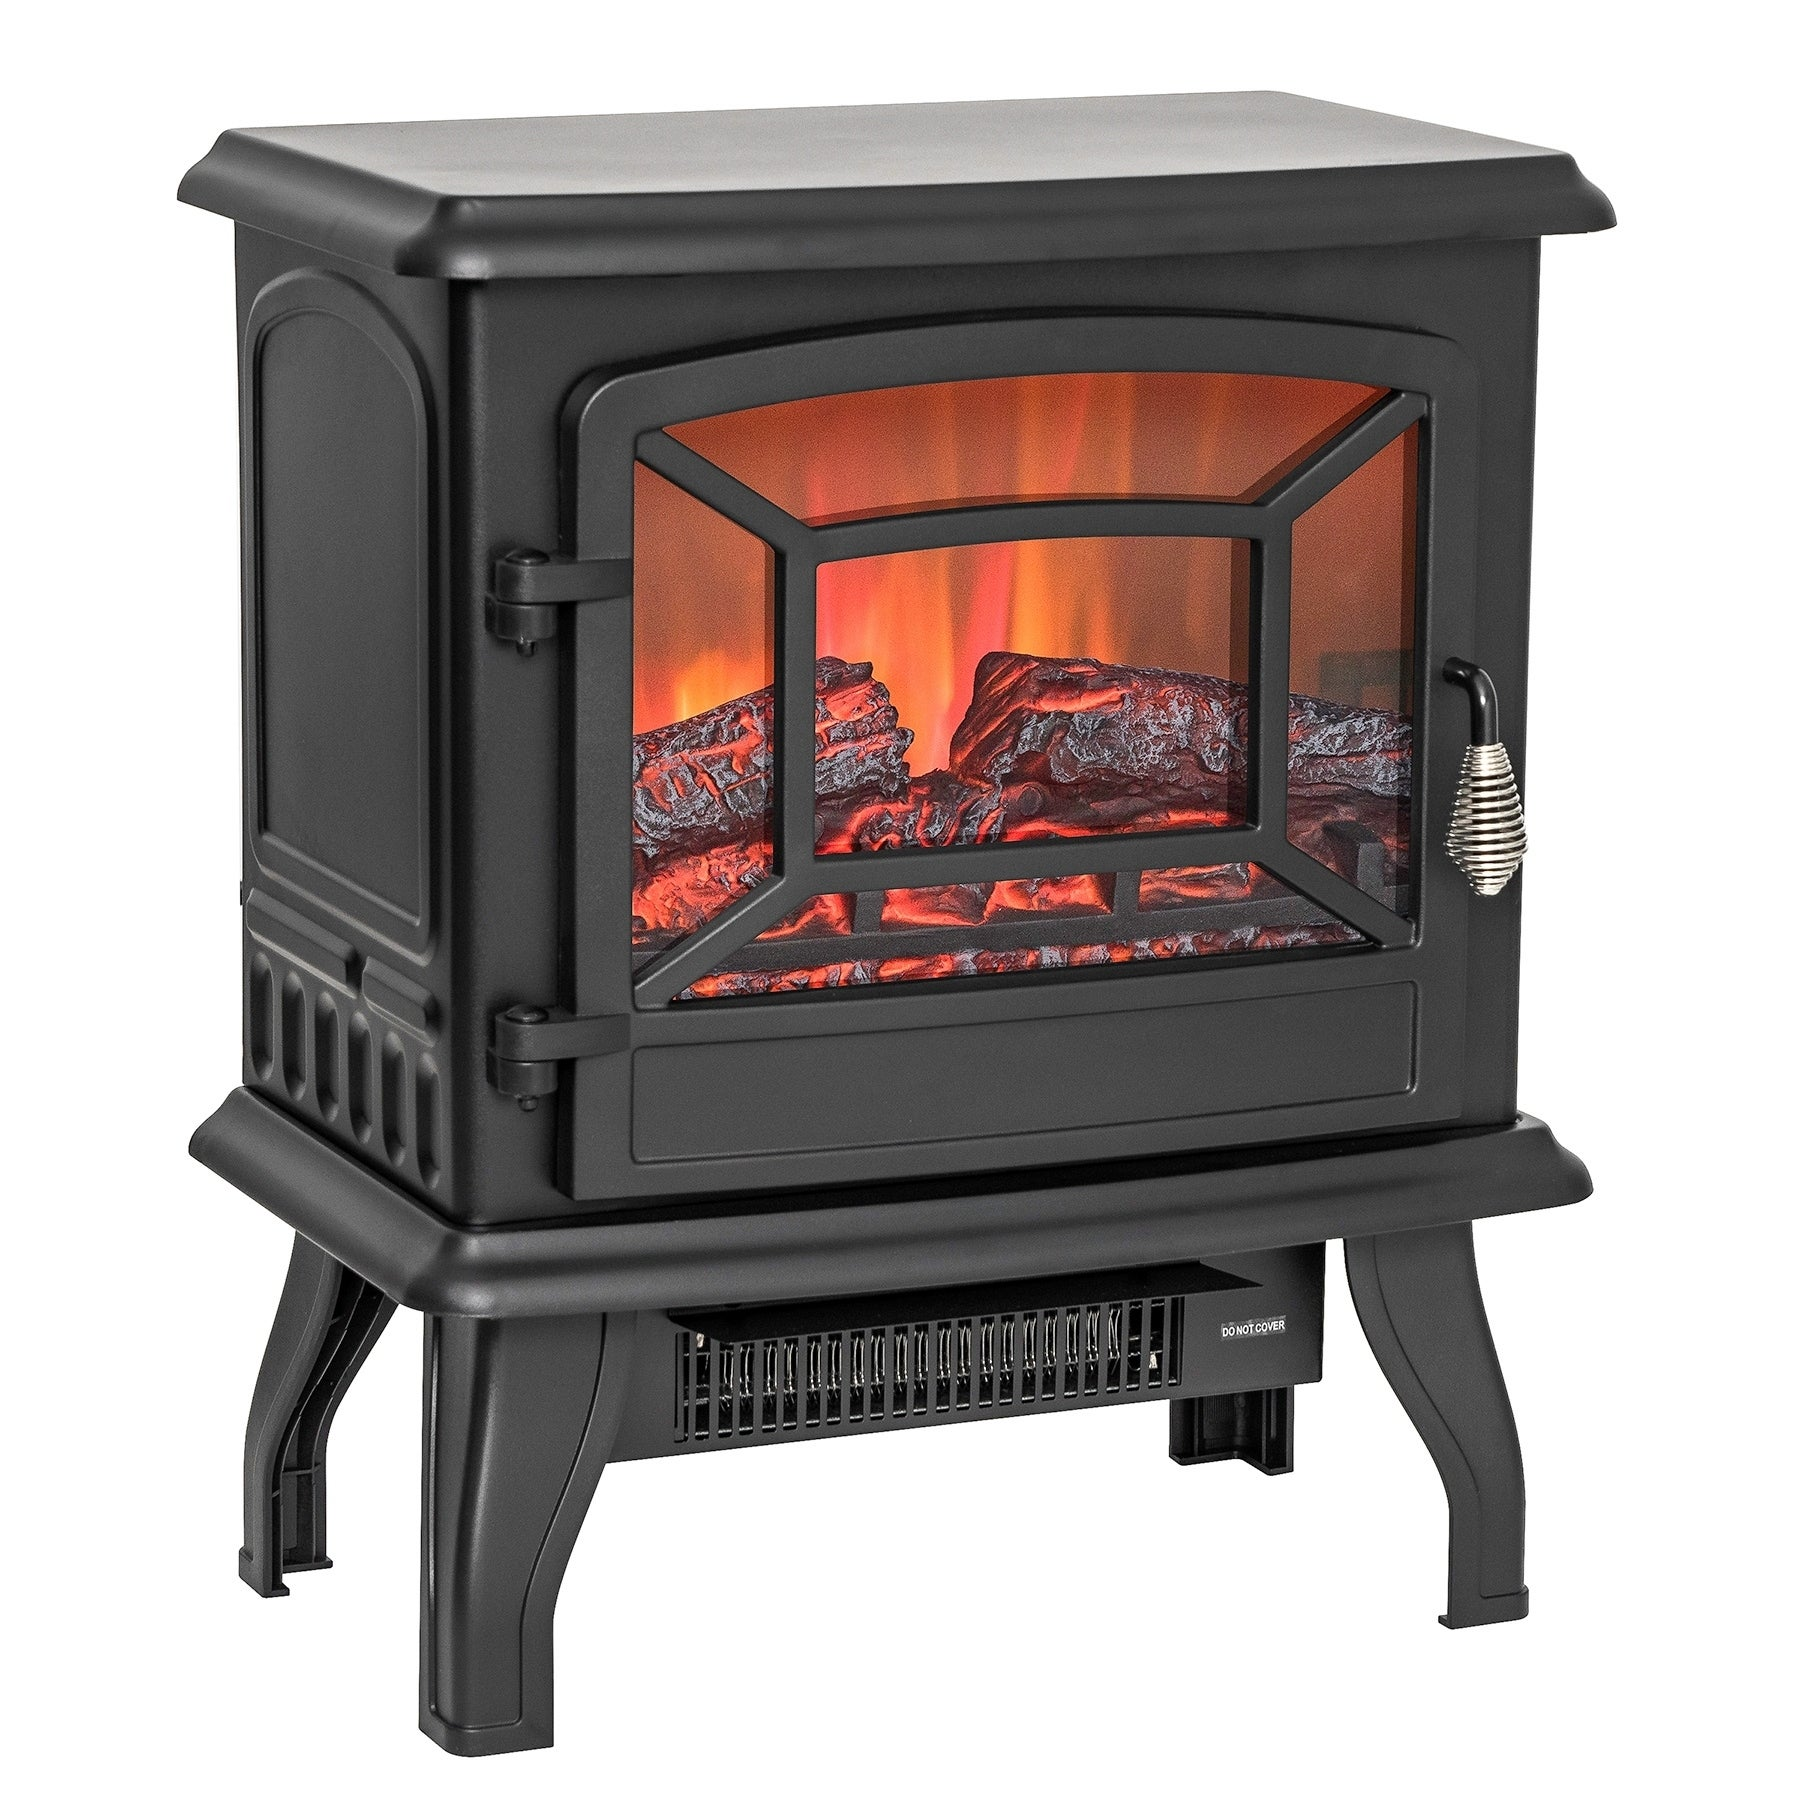 AKDY FP0078 17 Freestanding Portable Electric Fireplace 3D Flames Firebox w Logs Heater e1b5293b 5219 4064 8c41 903b6a